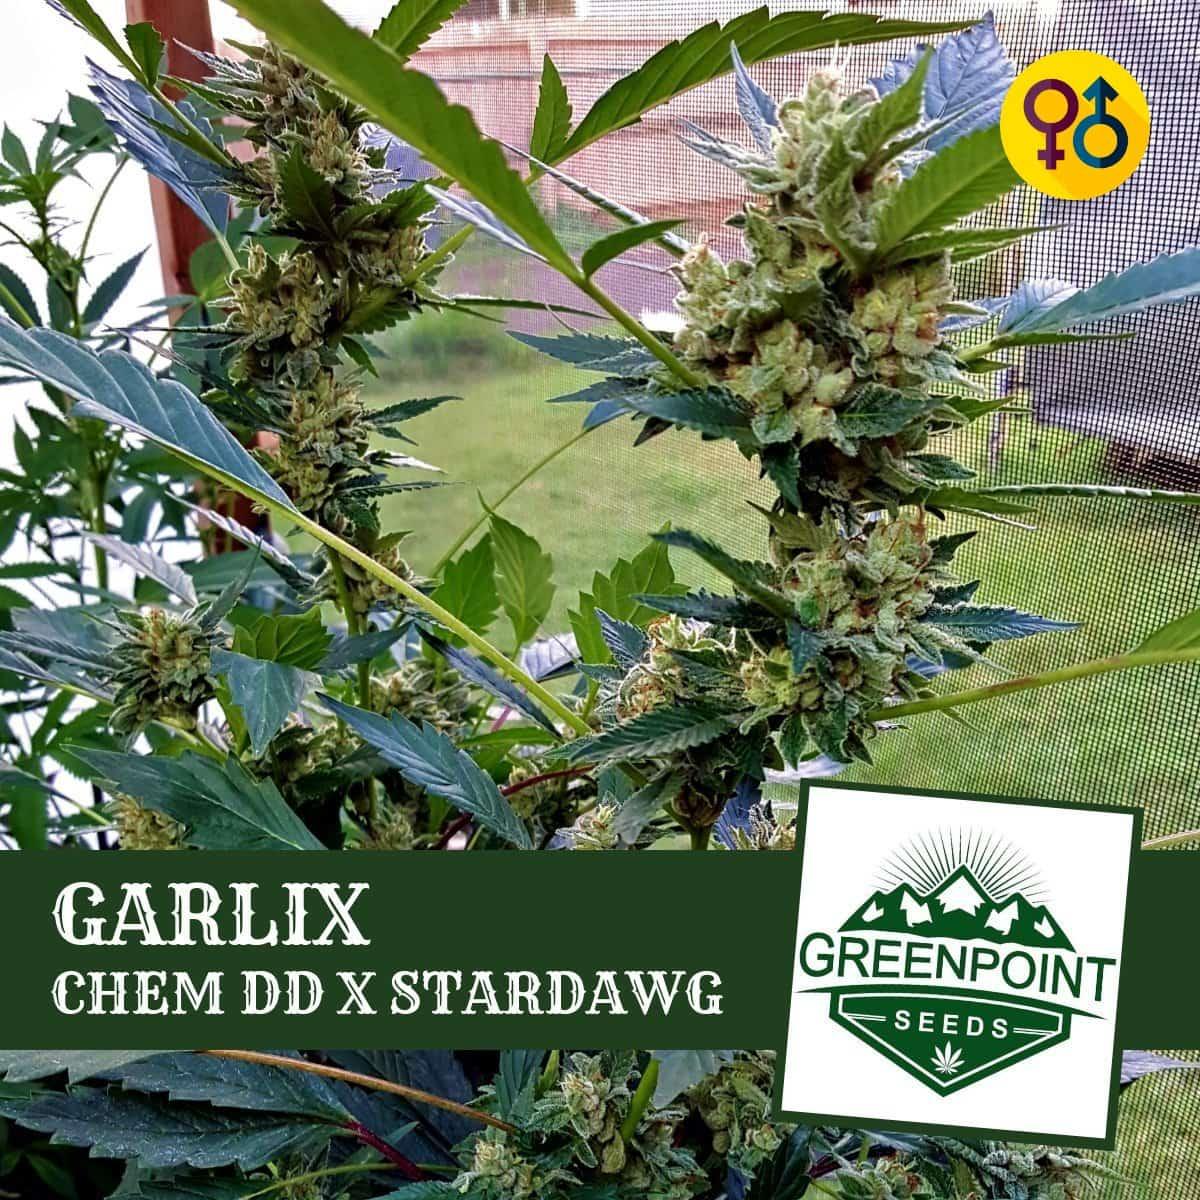 Garlix - Chem DD x Stardawg Cannabis Seeds | Greenpoint Seeds